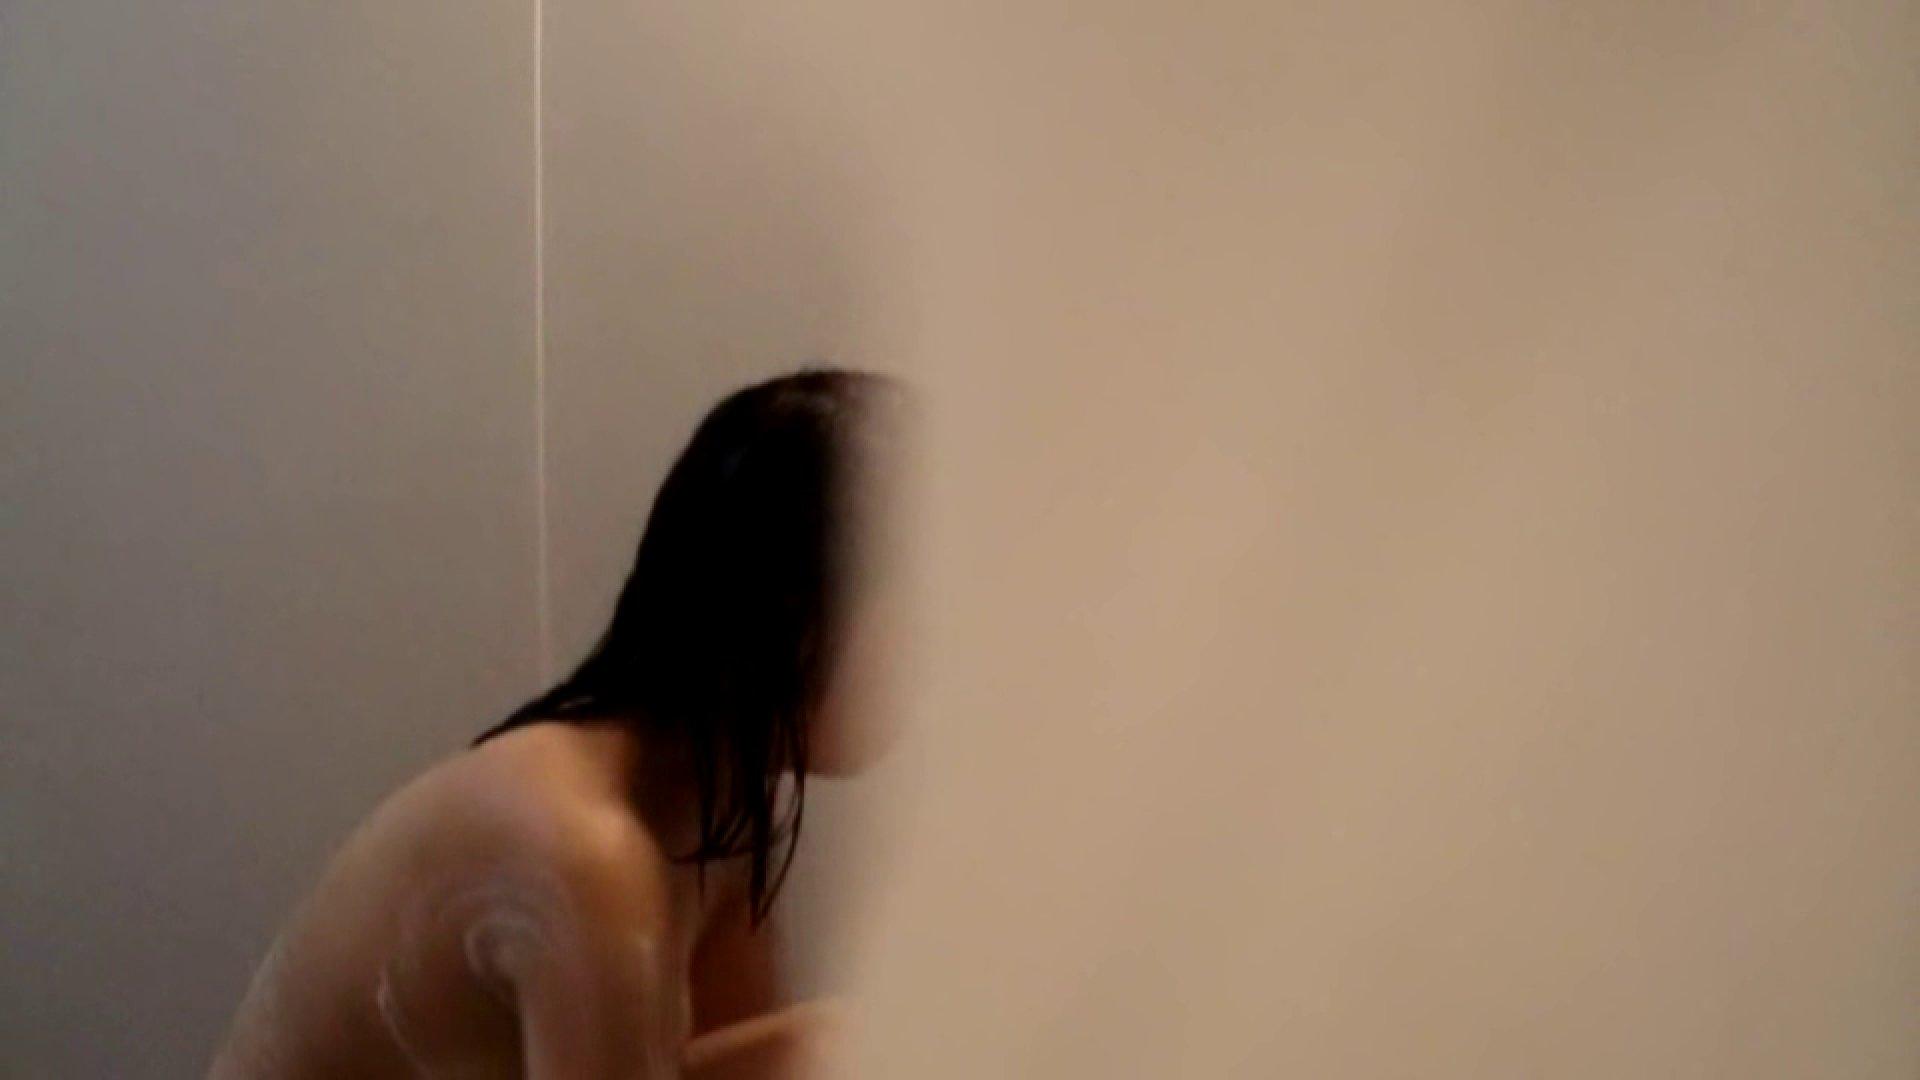 vol.2 葵のグラドル顔負けの爆乳を入浴シーンでどうぞ。 民家 オマンコ無修正動画無料 110枚 84